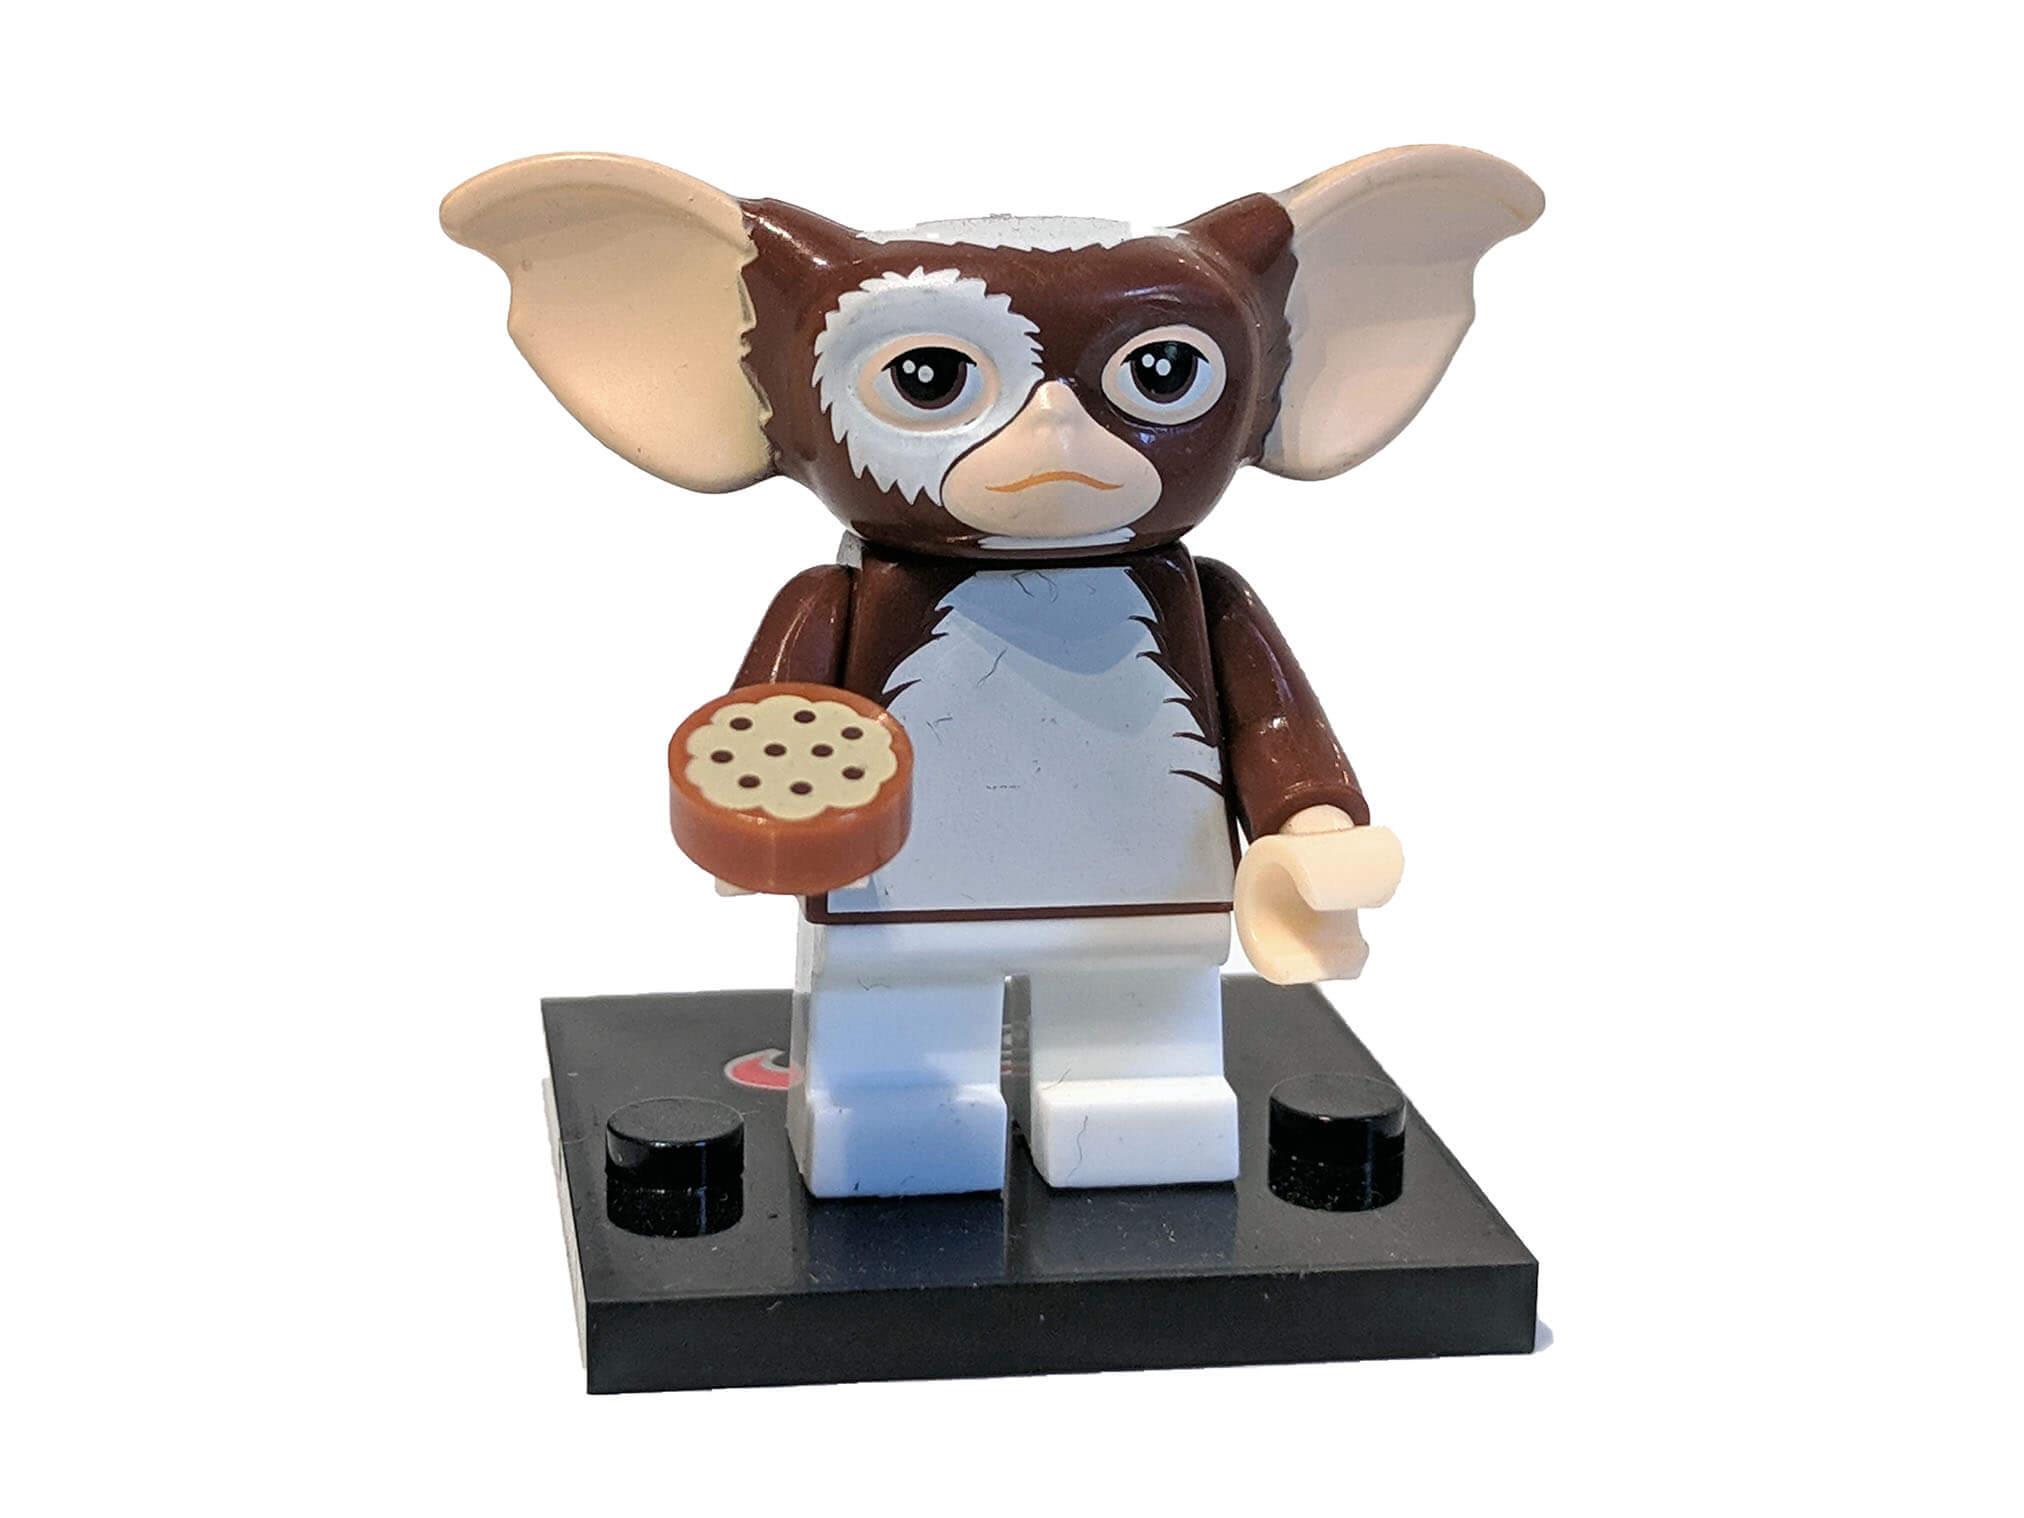 LEGO-Gremlins-Gizmo.jpg